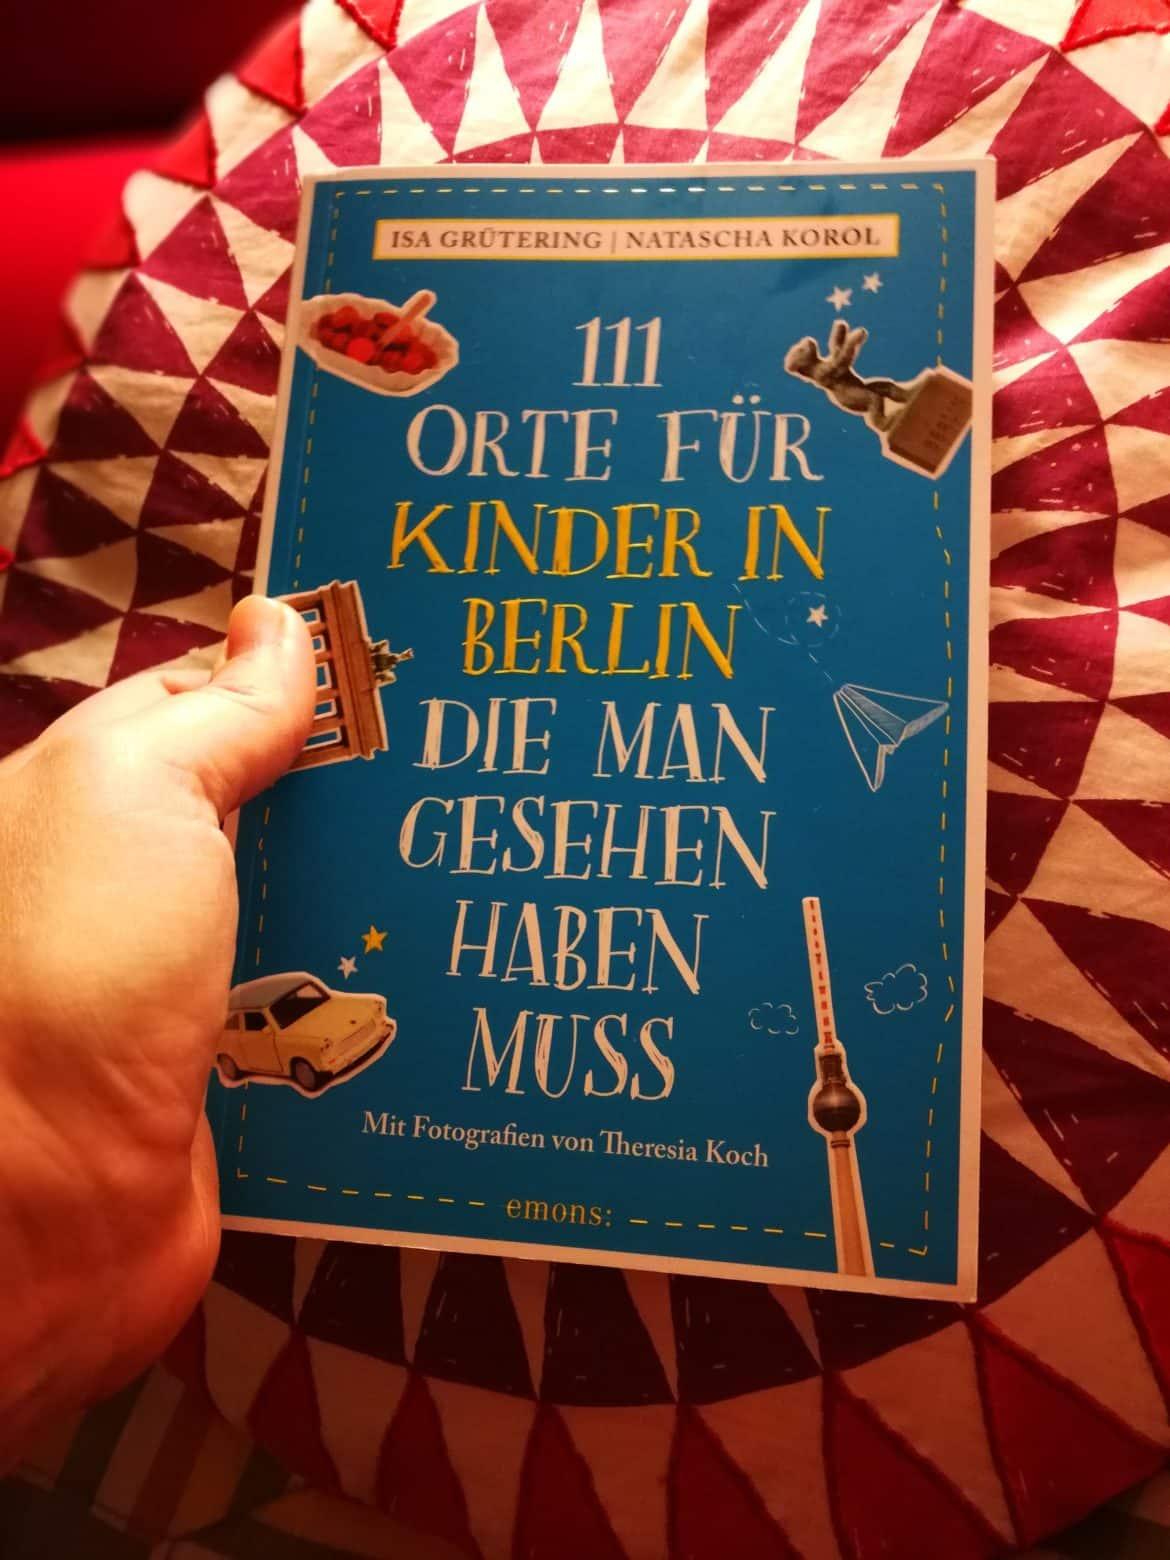 111 Orte für Kinder in Berlin - emons